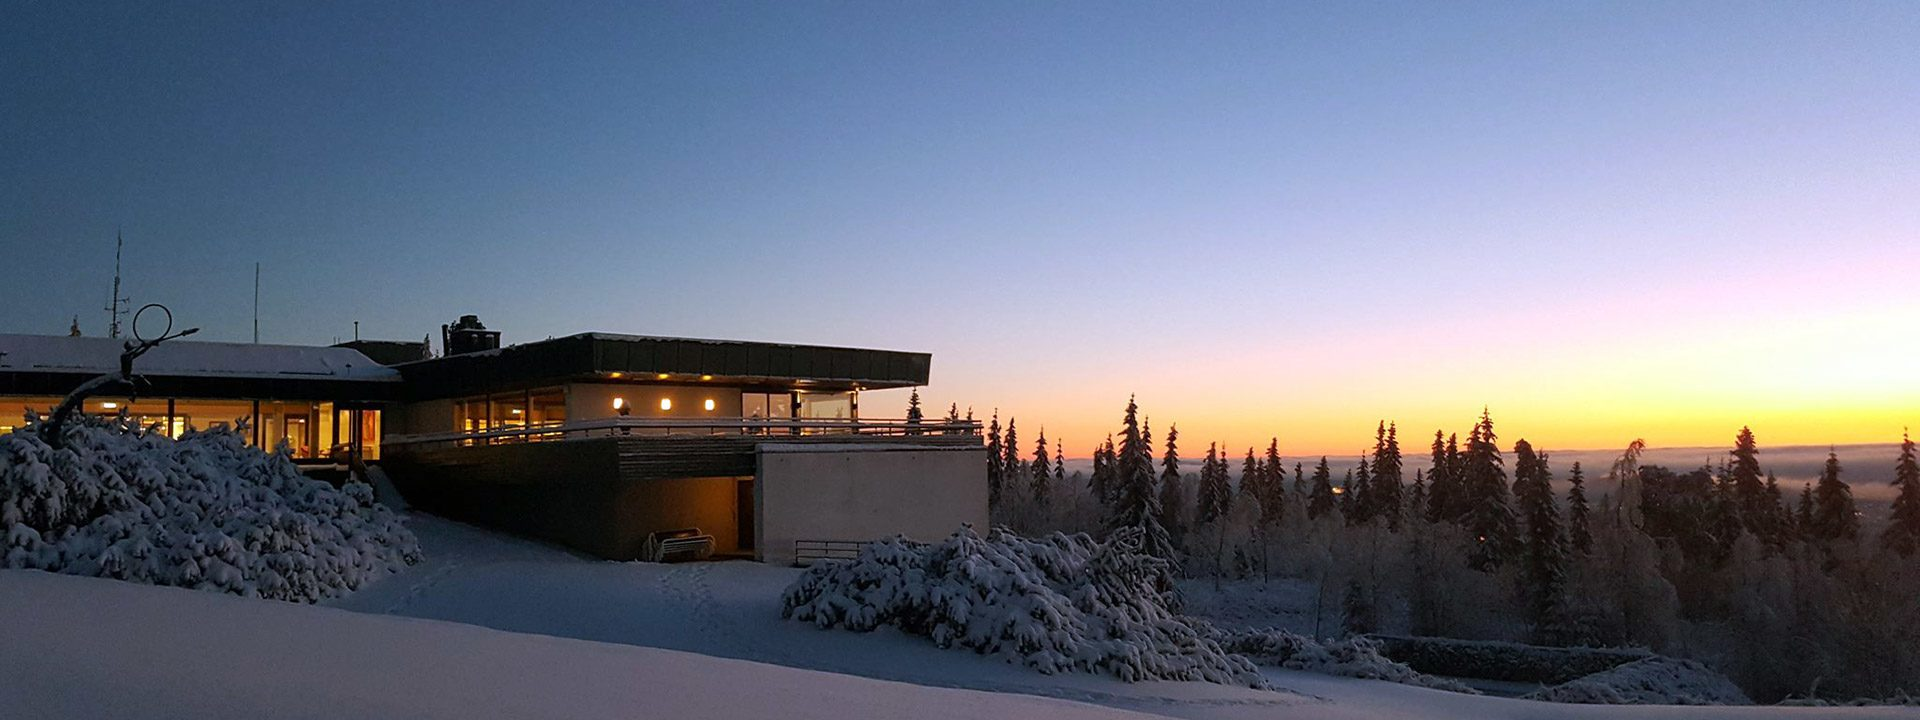 vinteromgivelser og kveld på Voksenåsen